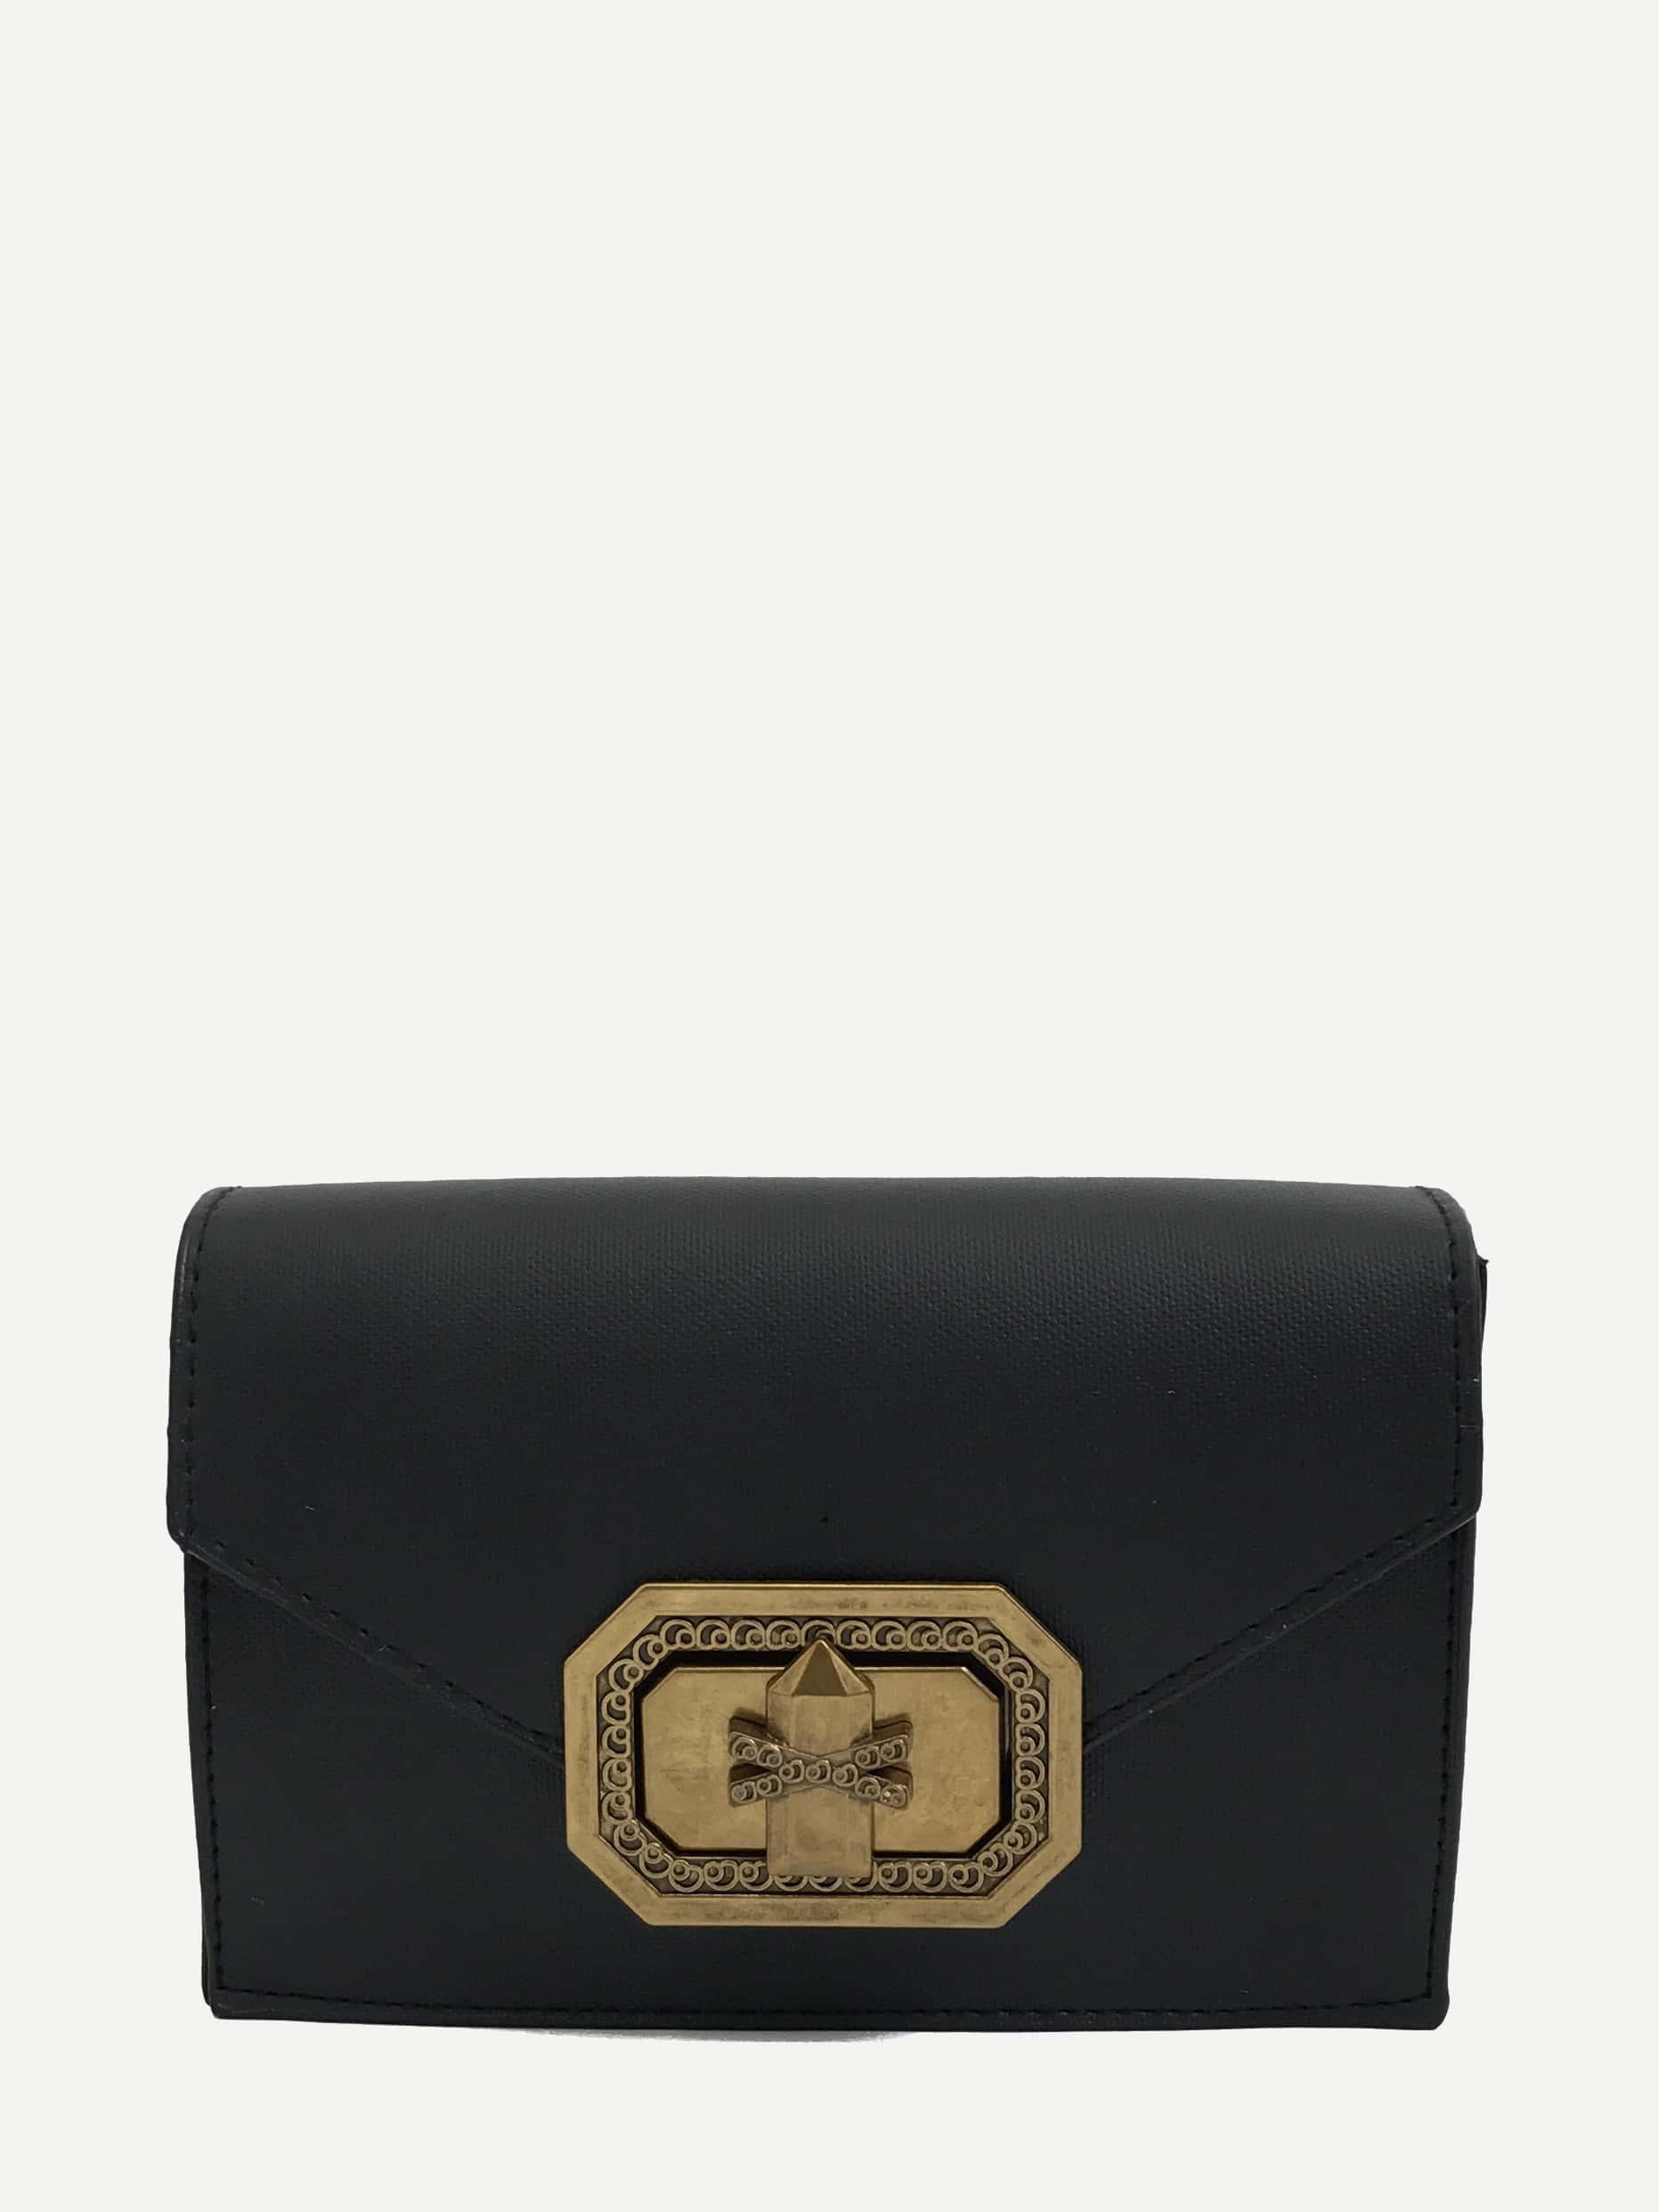 PU Crossbody Bag With Adjustable Strap